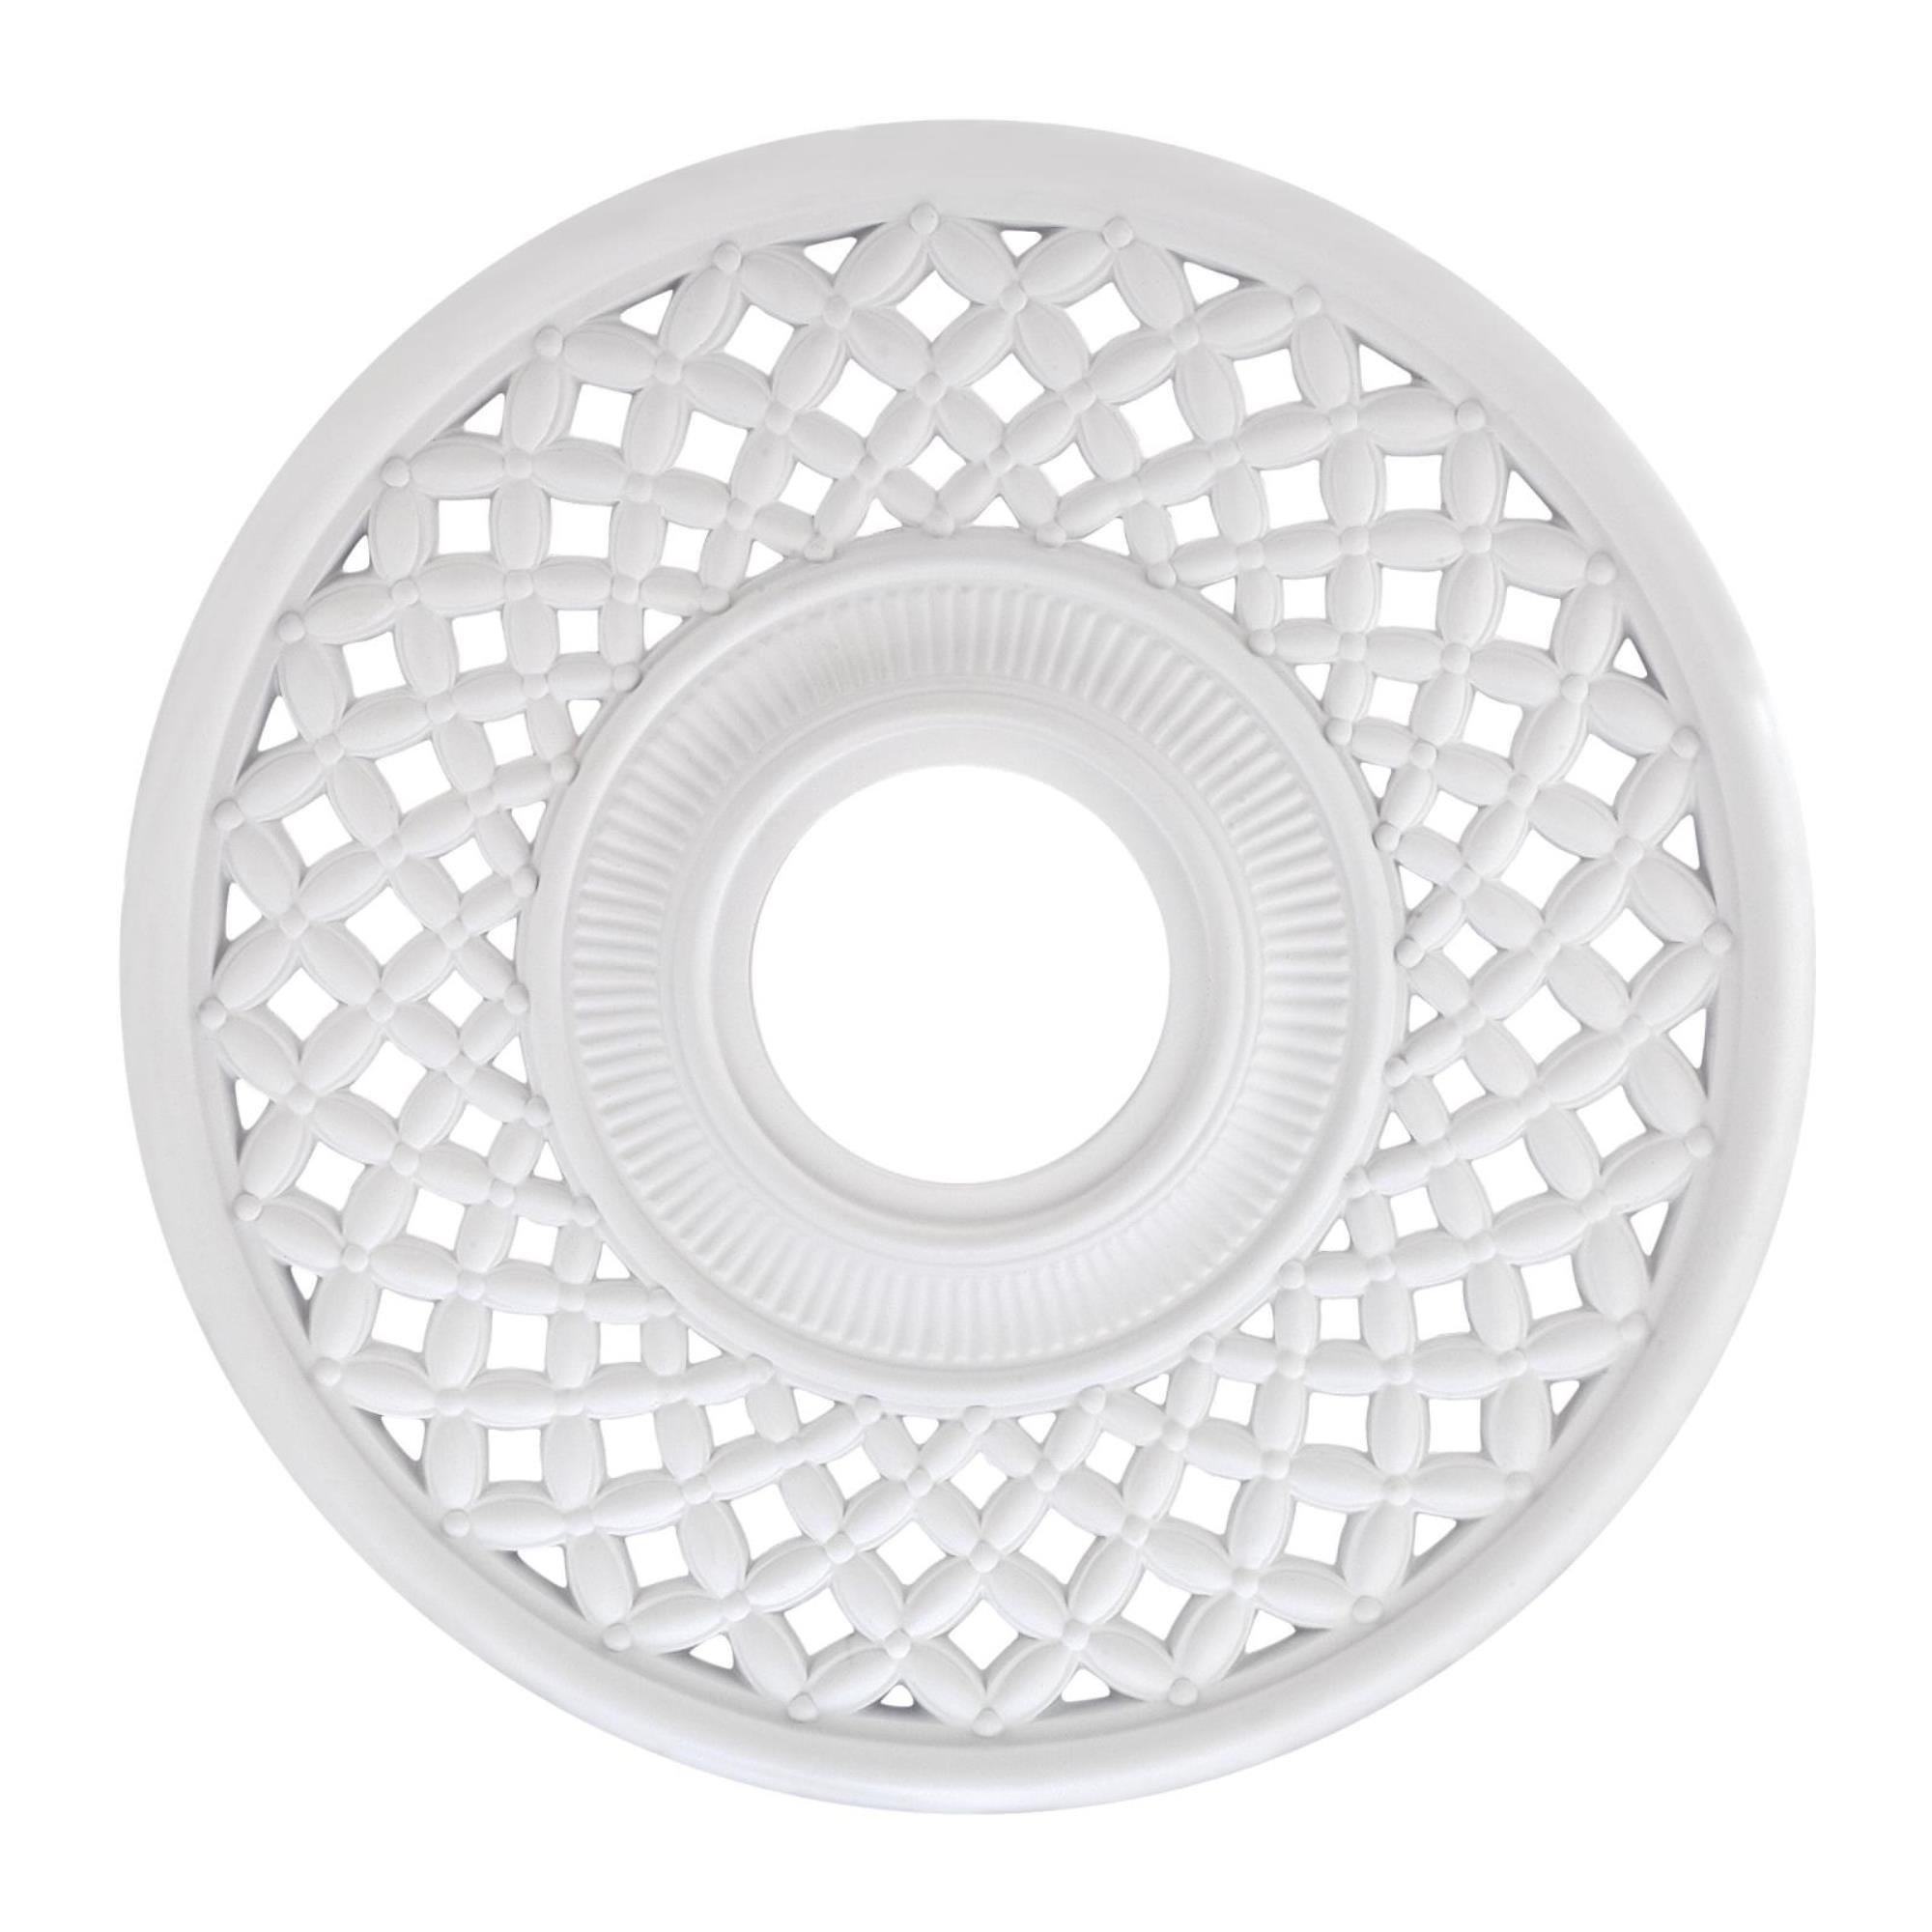 Westinghouse 7771000 12-Inch White Finish Botino Ceiling Medallion by Westinghouse